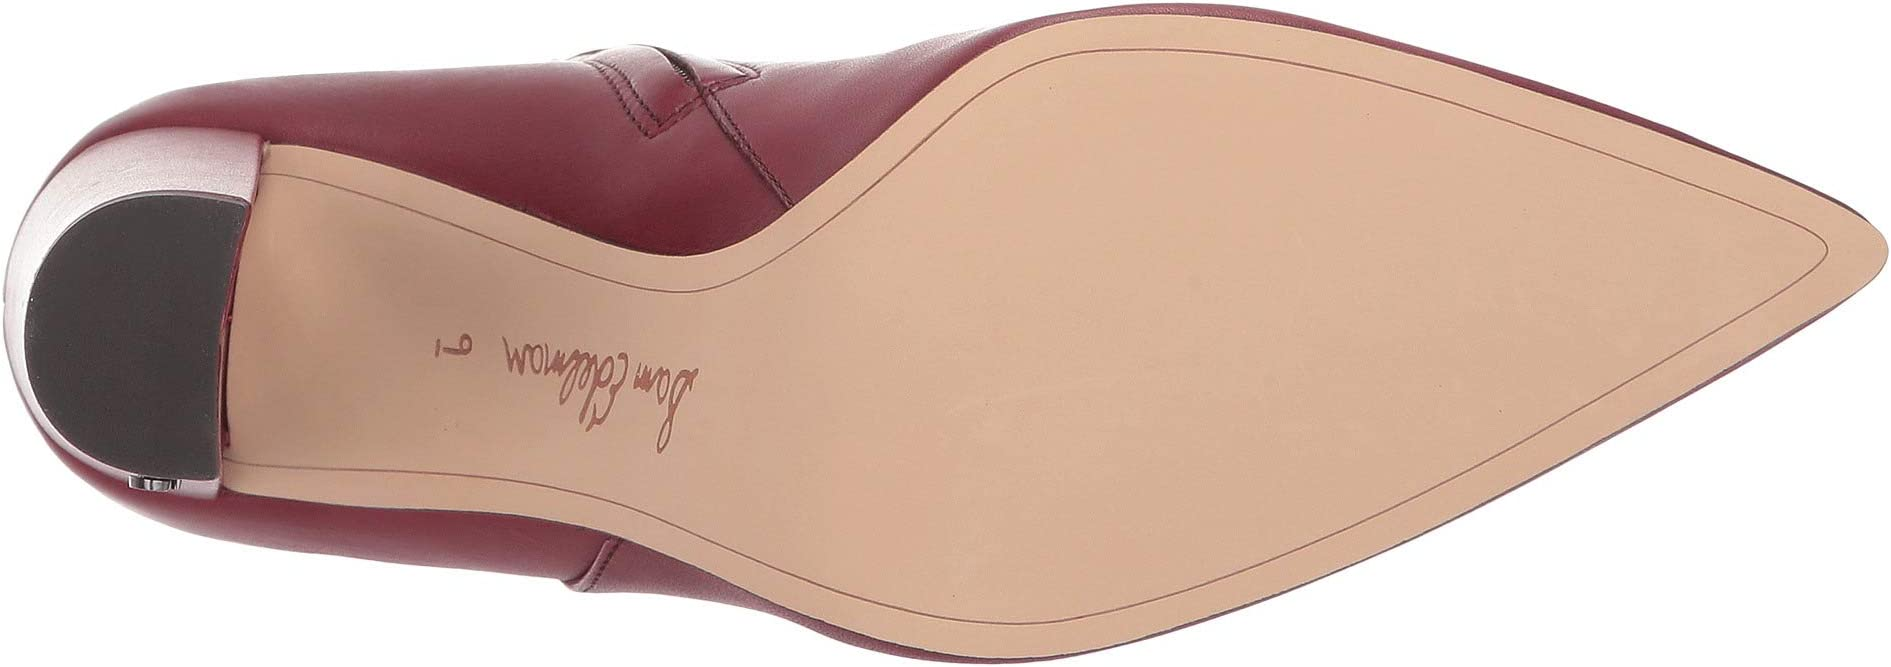 Sam Edelman Raelle   Women's shoes   2020 Newest